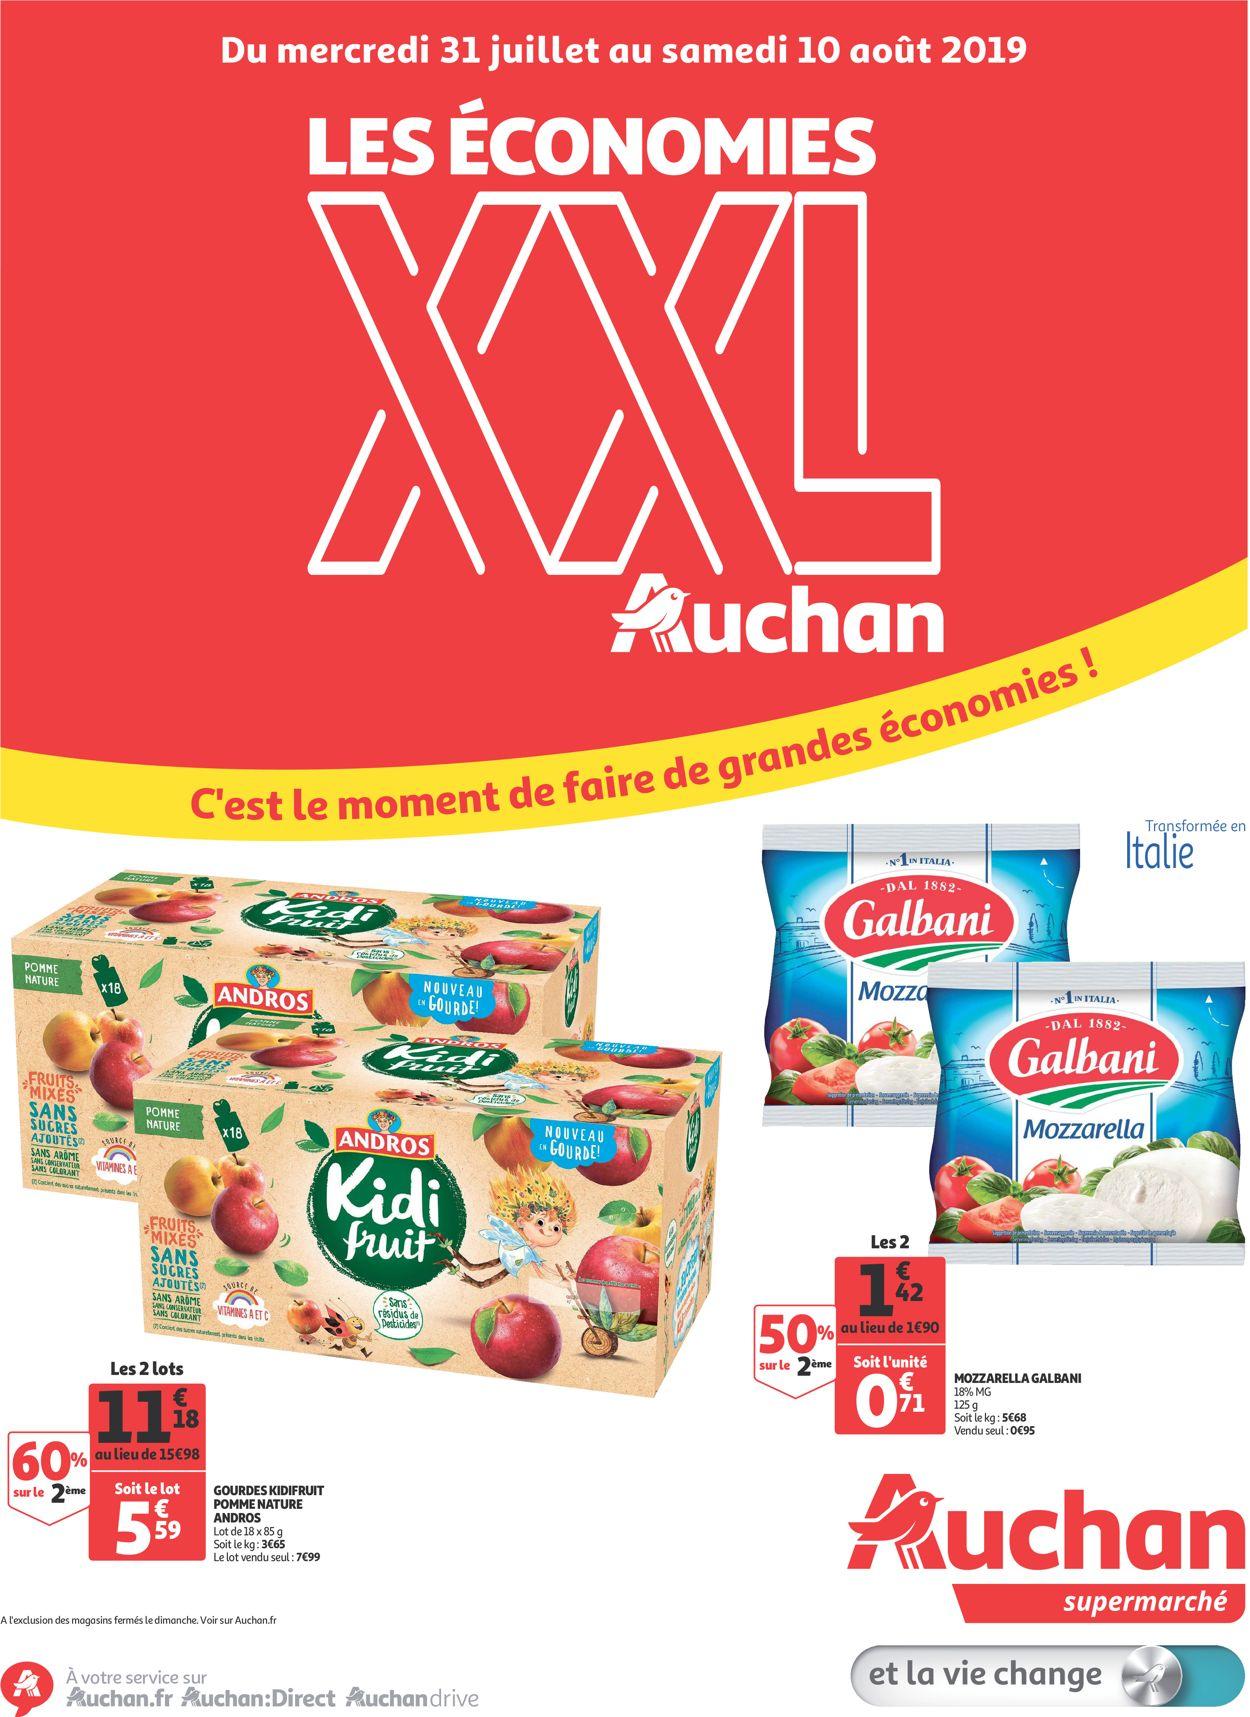 Auchan Catalogue - 31.07-10.08.2019